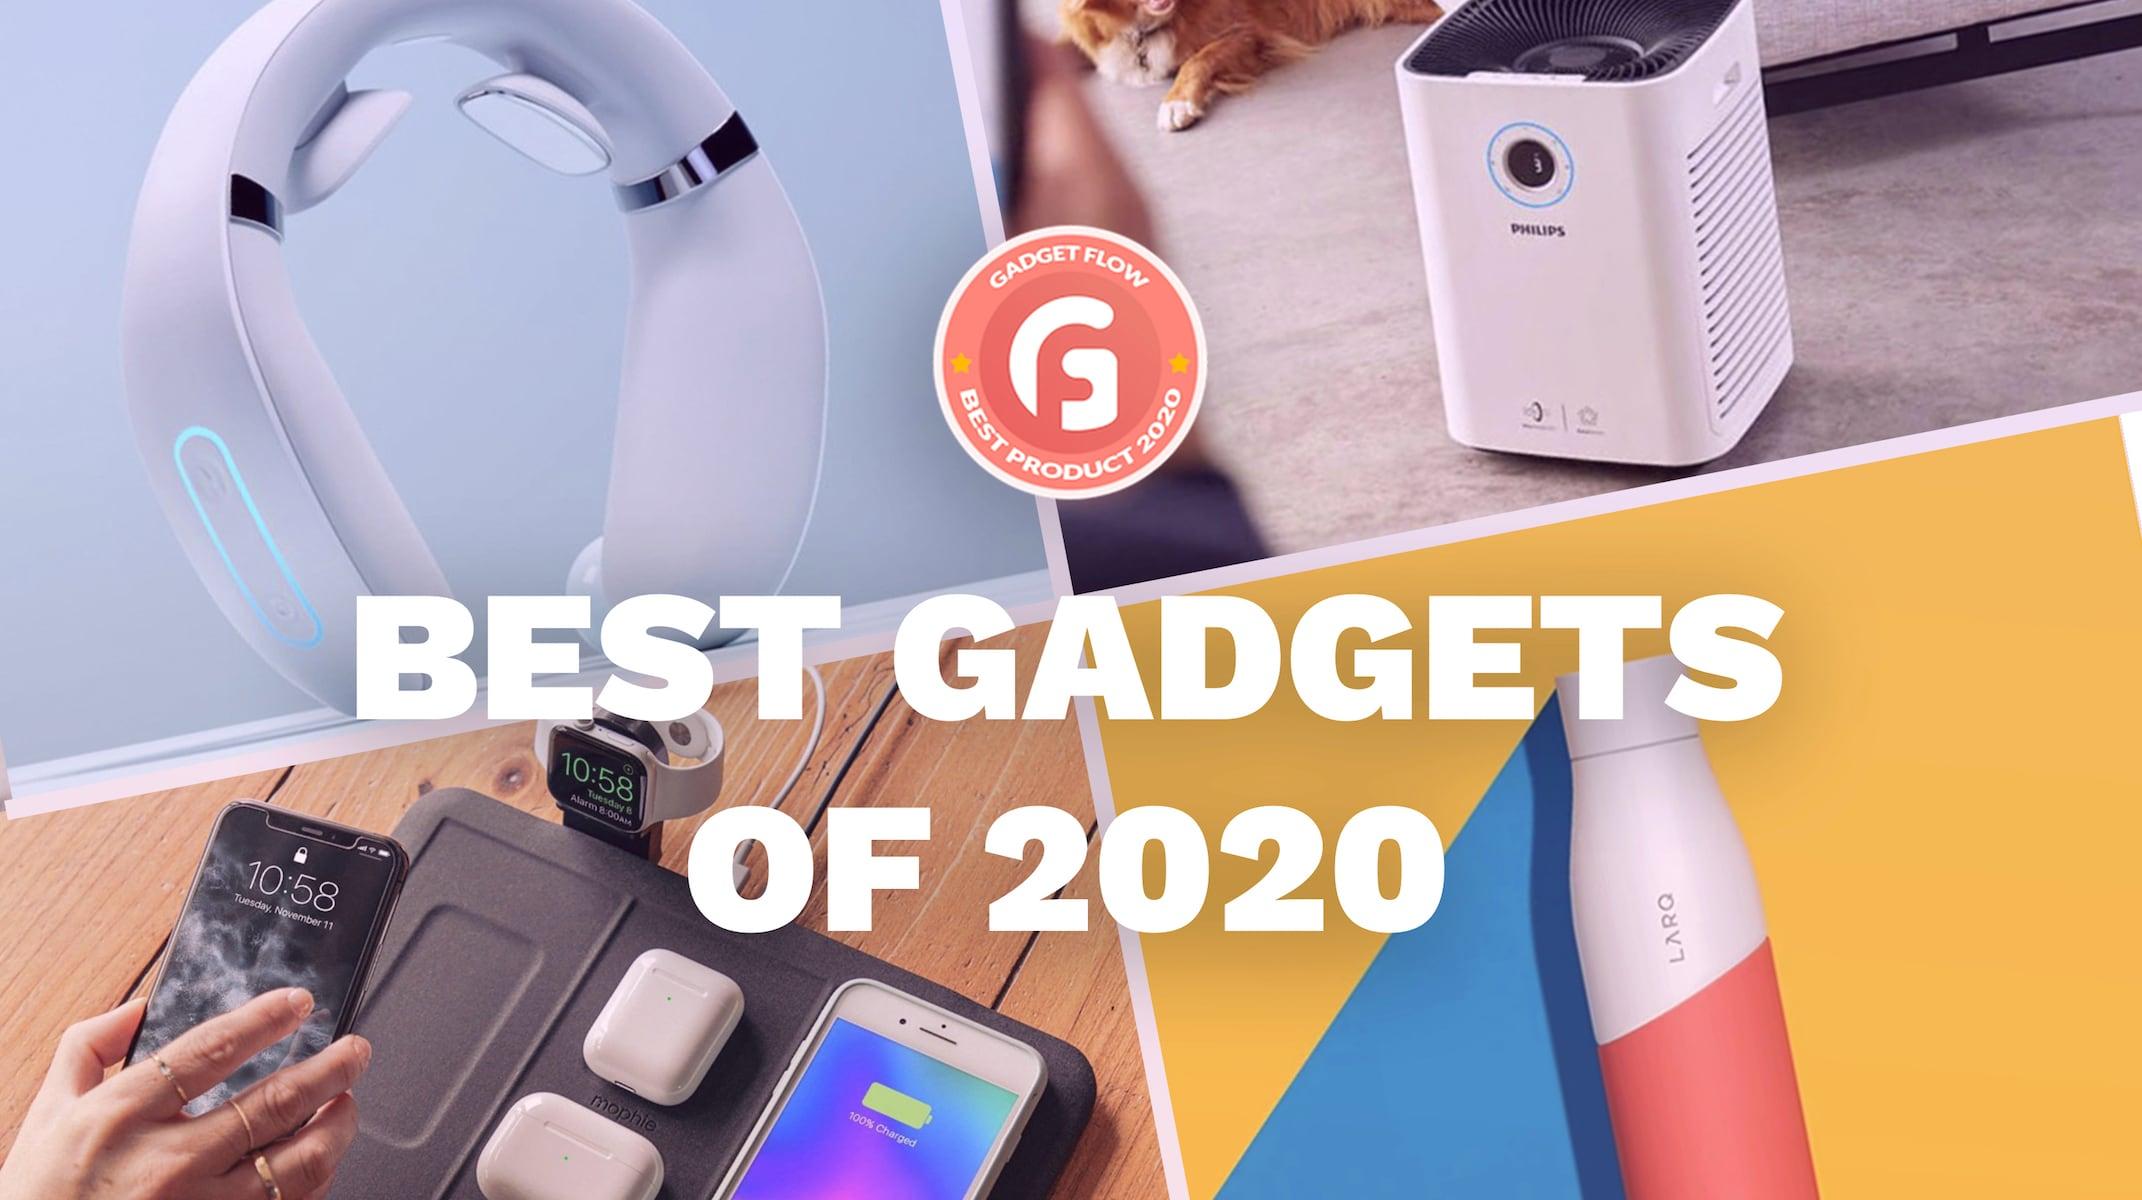 Best gadgets of 2020